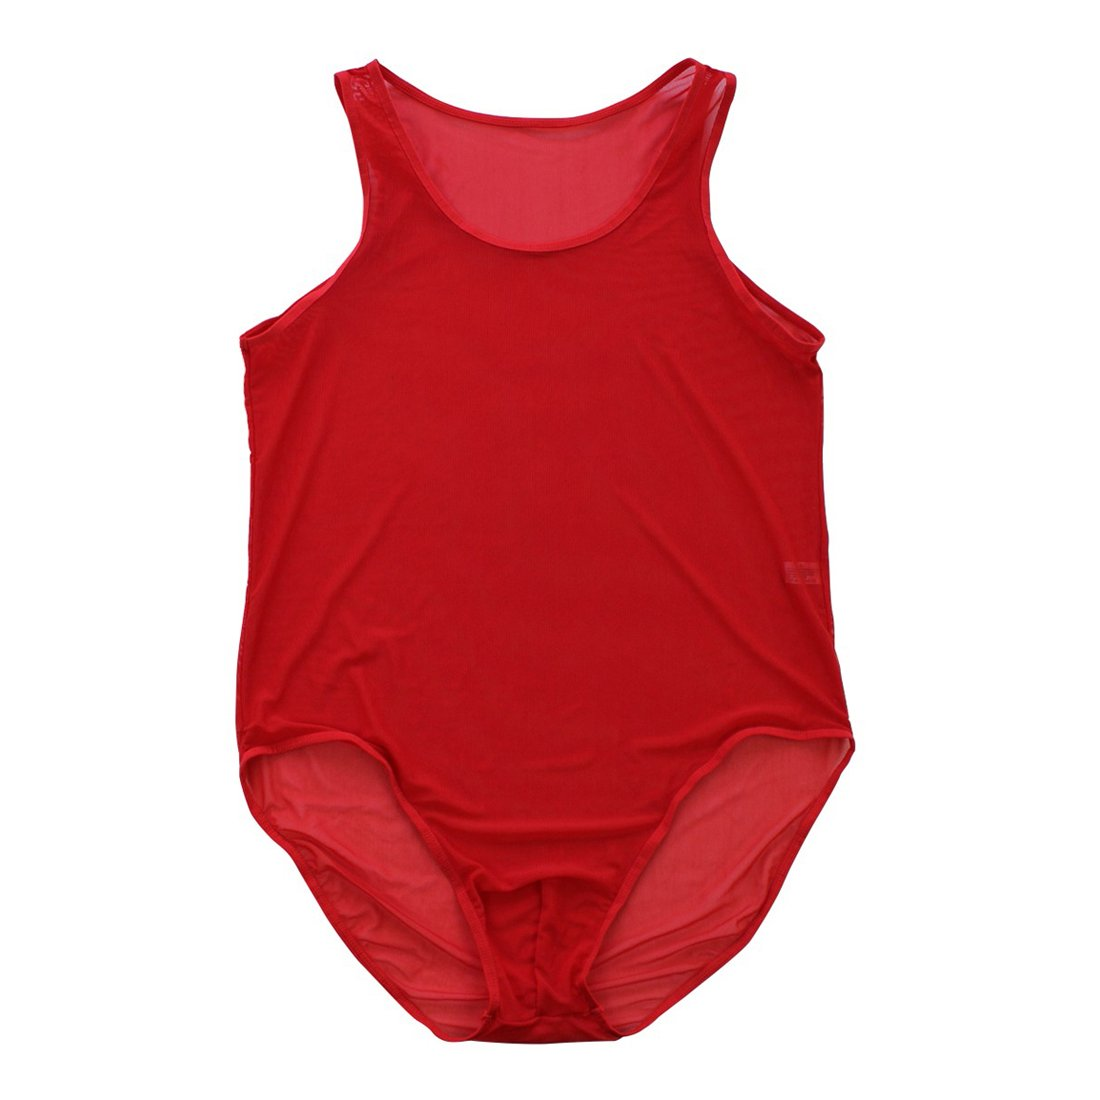 FEESHOW Men's Mesh Jockstrap Bodysuit Soft Bikini Briefs Underwear Lingerie